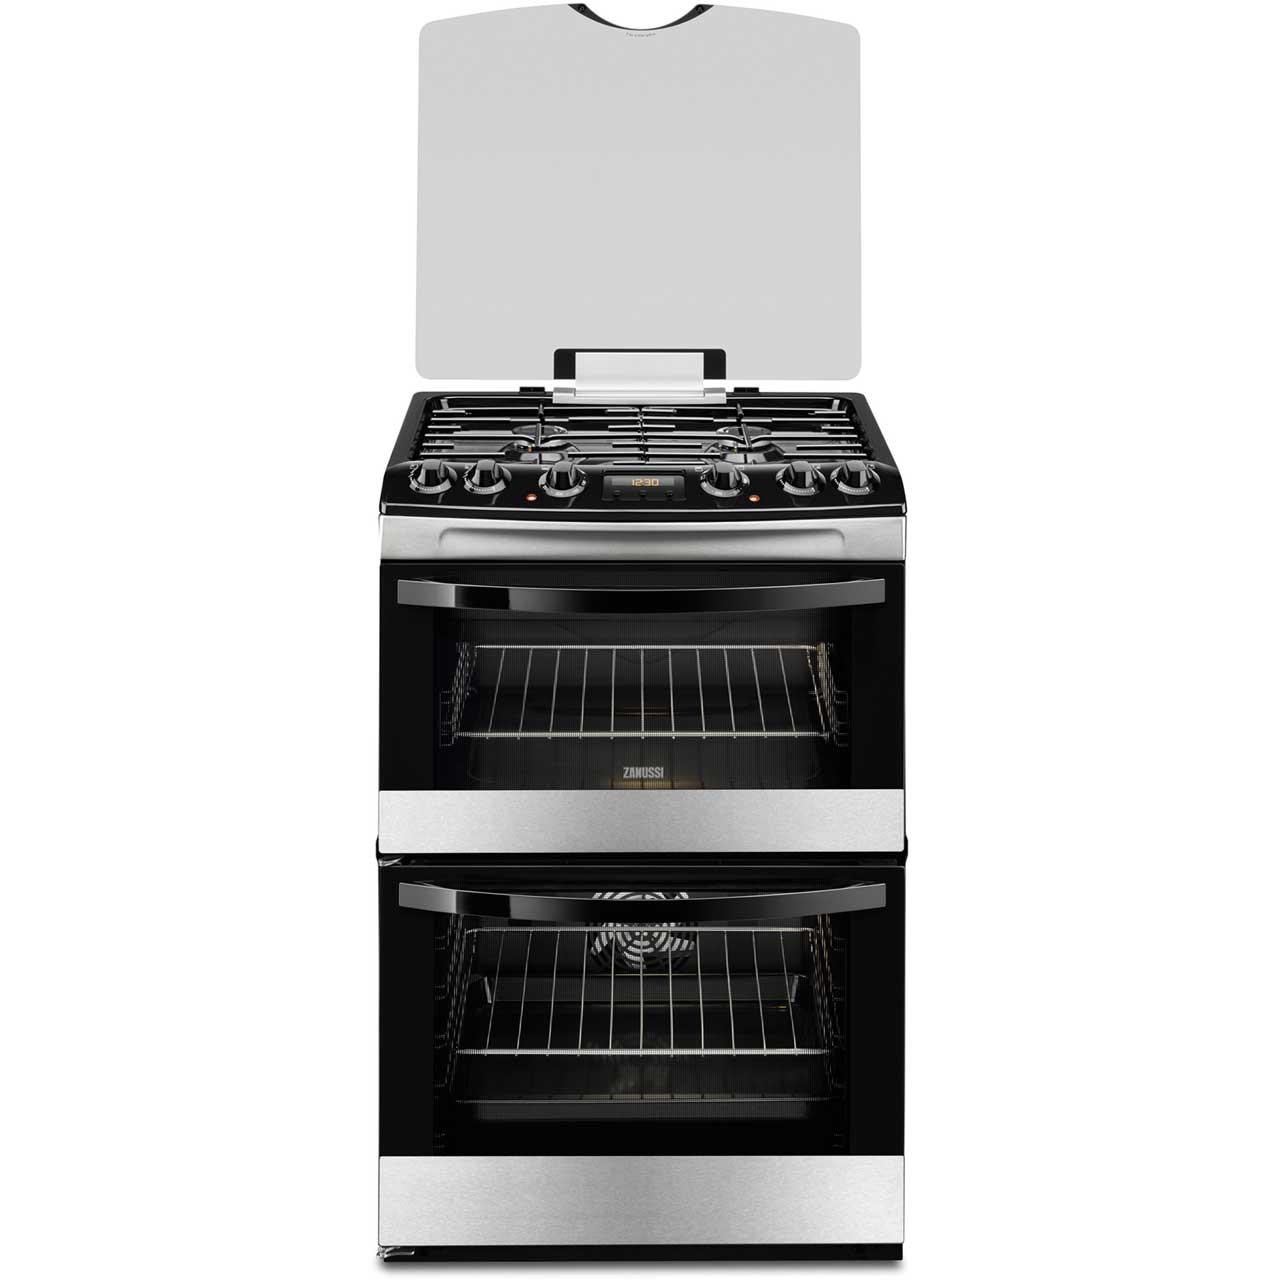 Zanussi Avanti ZCK68200X Free Standing Cooker in Stainless Steel